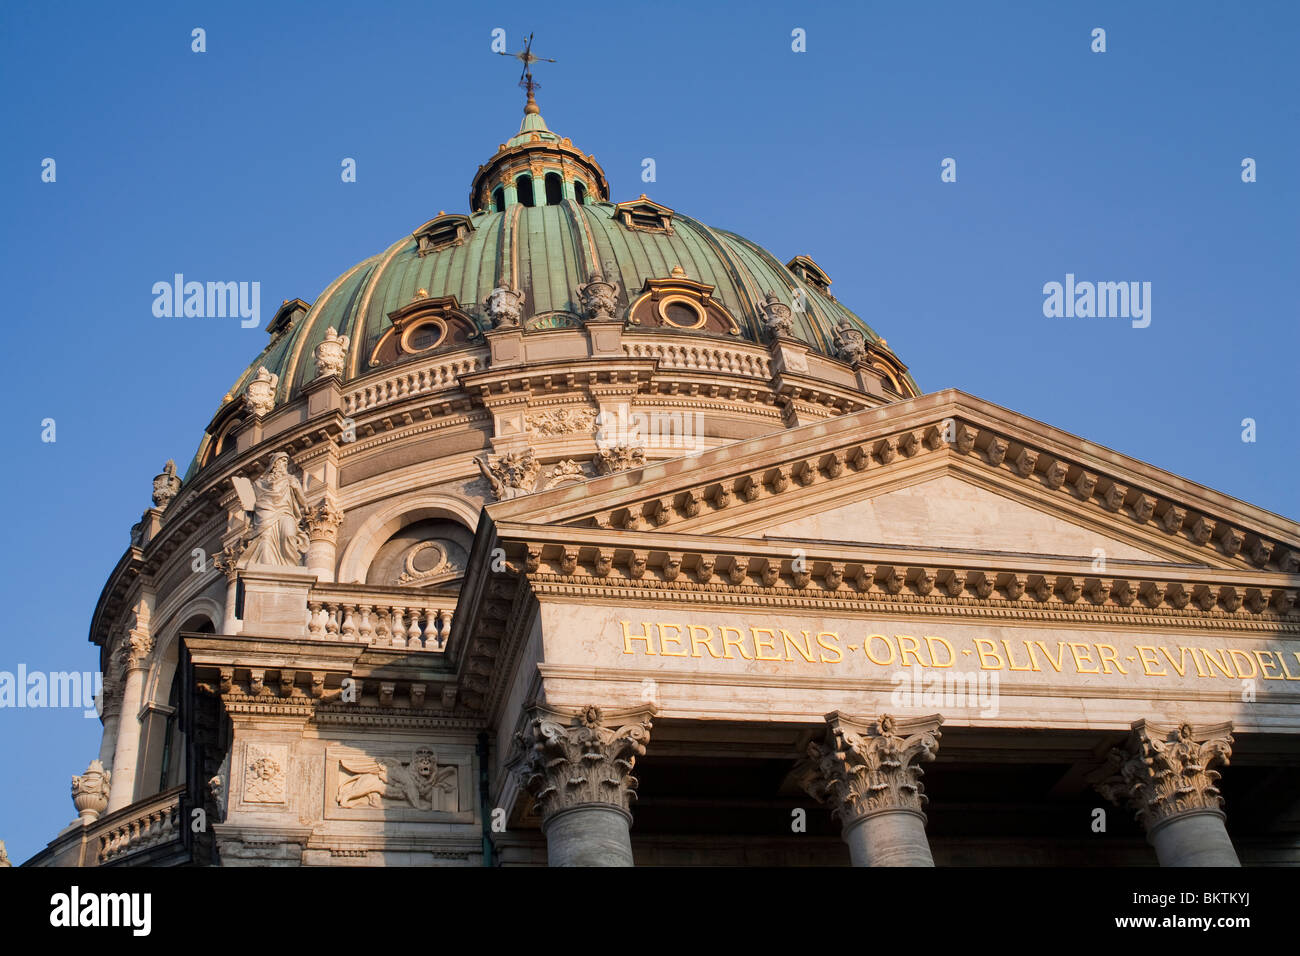 Domed roof of the Frederikskirken or Marmorkirken (Marble Church), Copenhagen - Stock Image